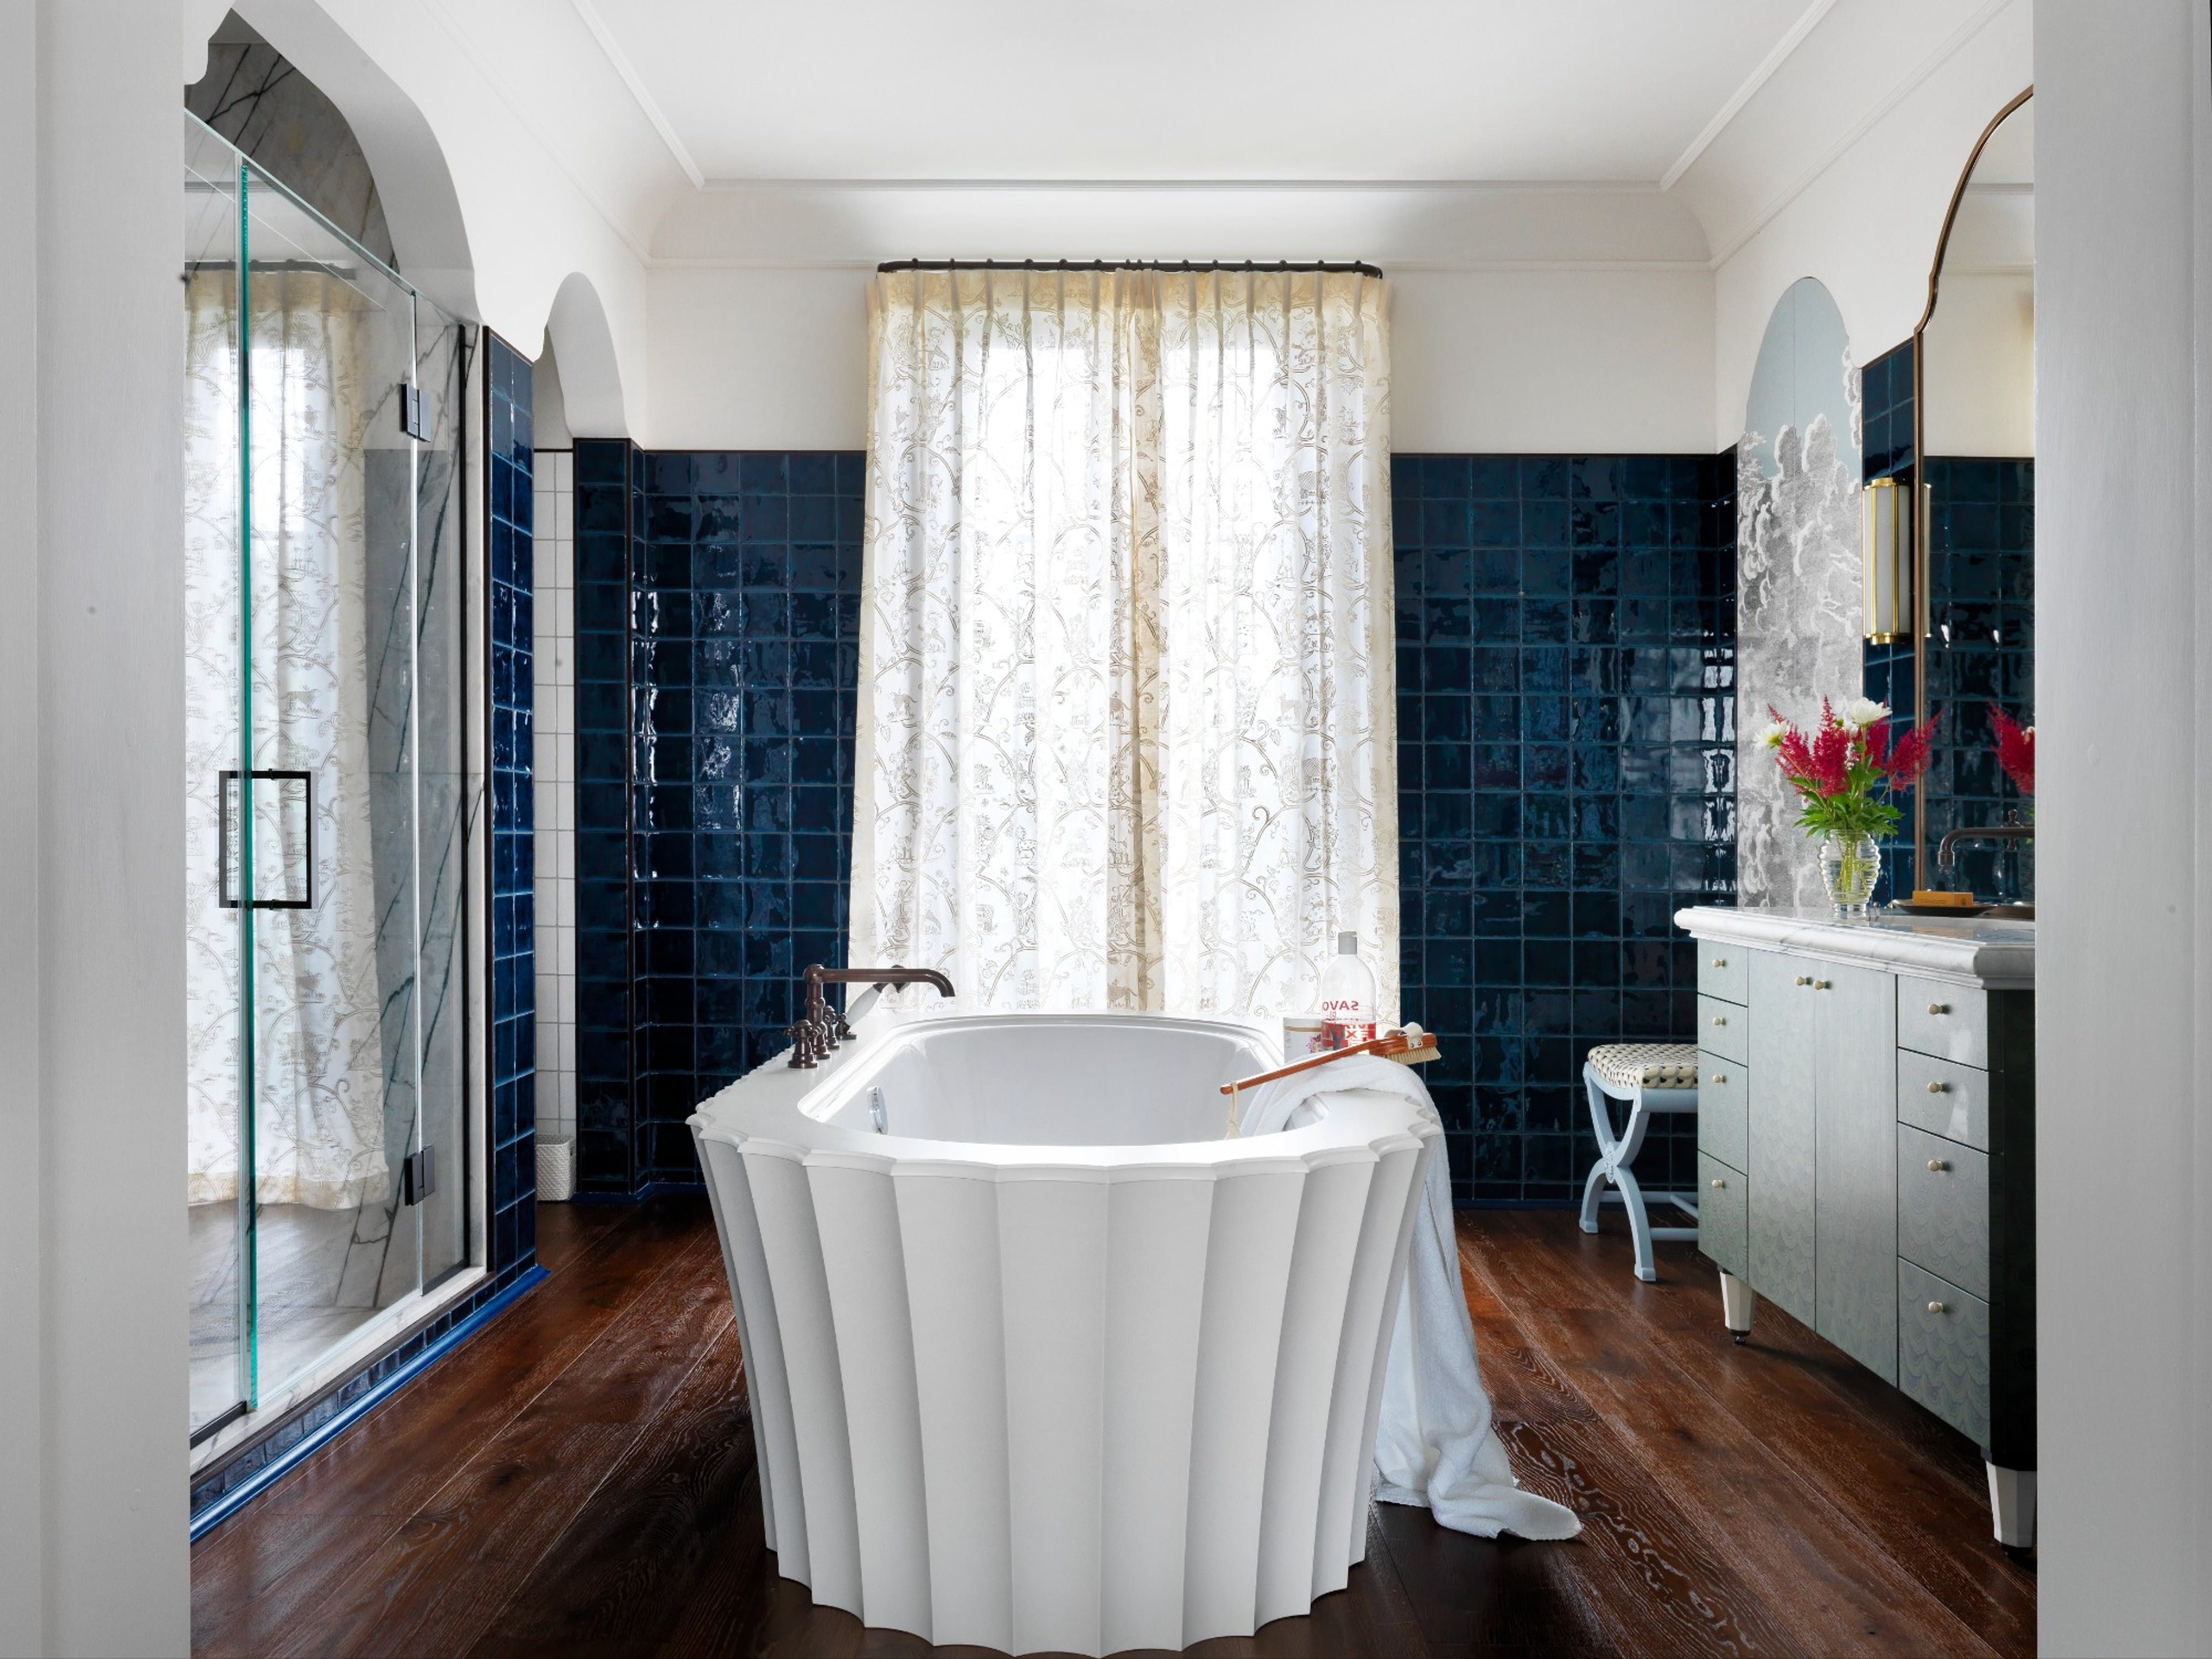 Best bathroom interior beataheumandportfolioeriorsth